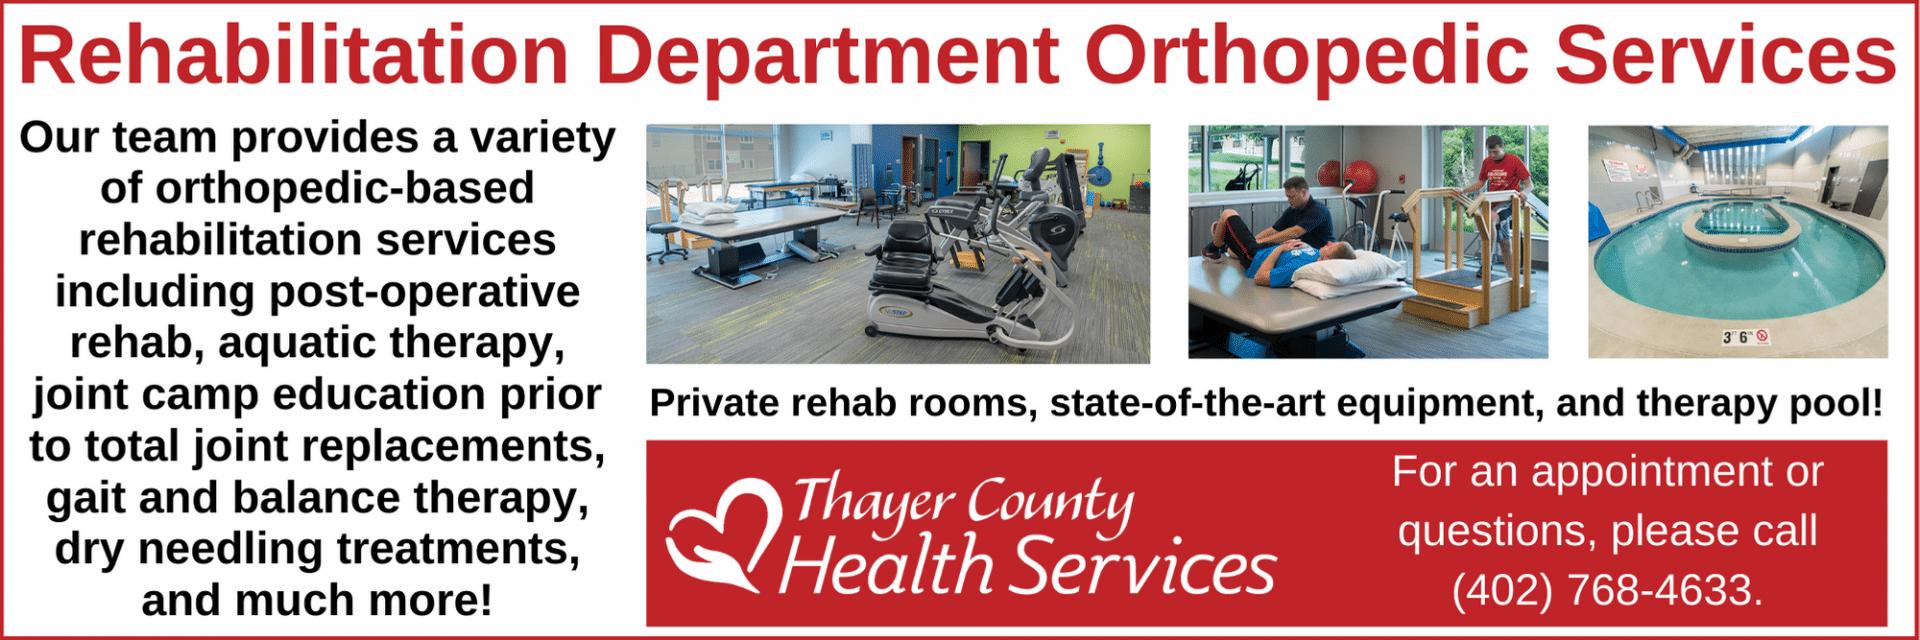 Orthopedic Rehab Services